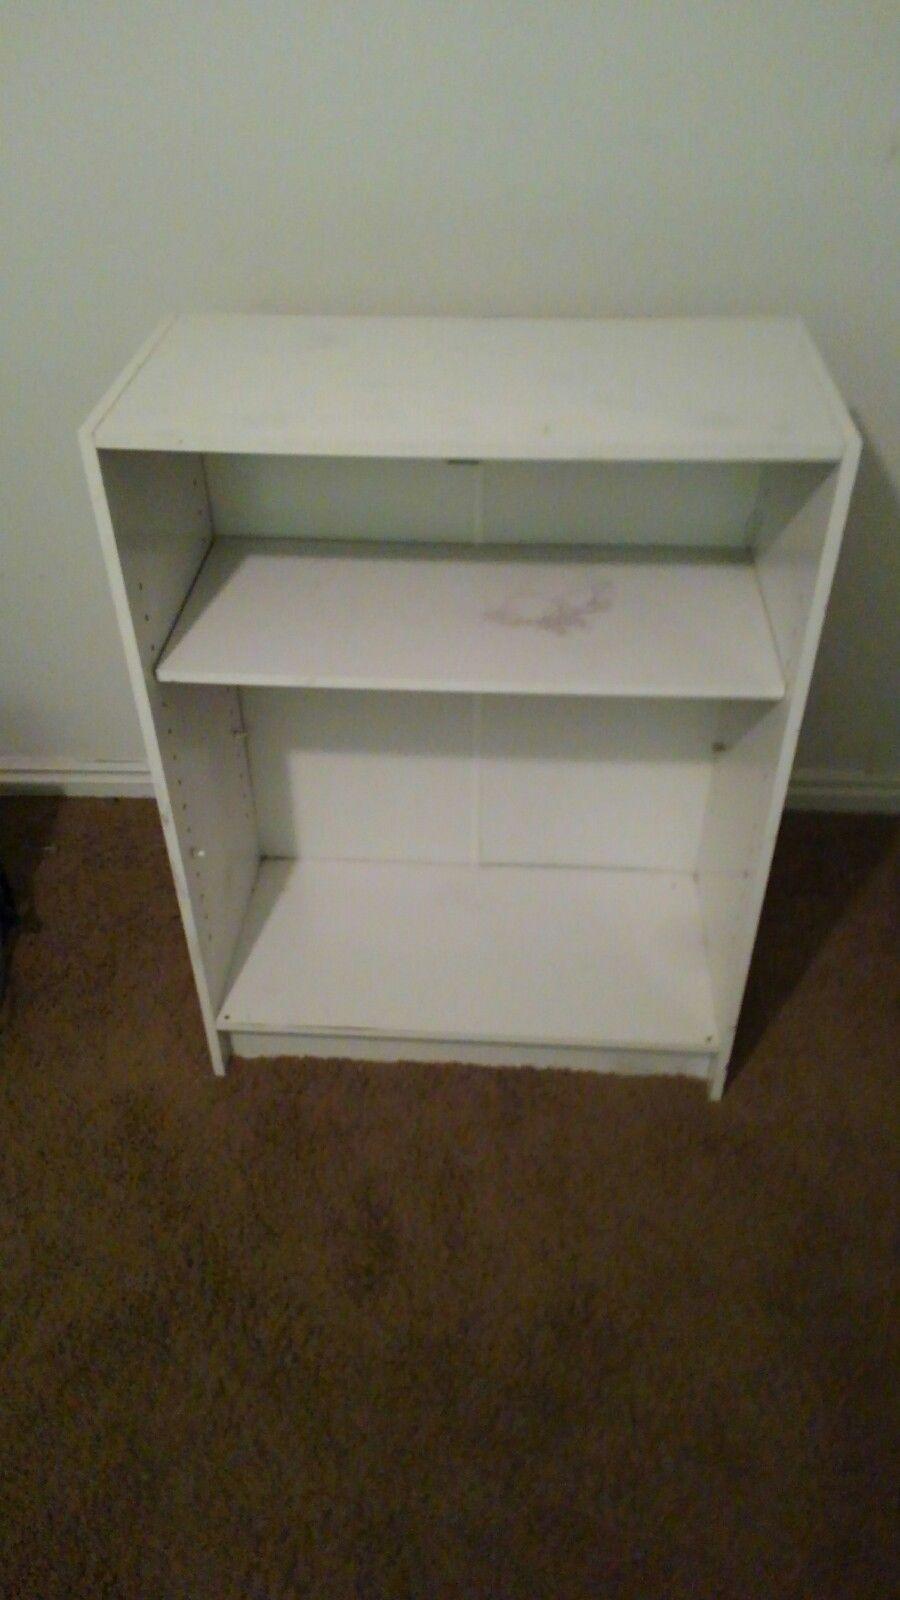 White double food/storage stand/shelf 1